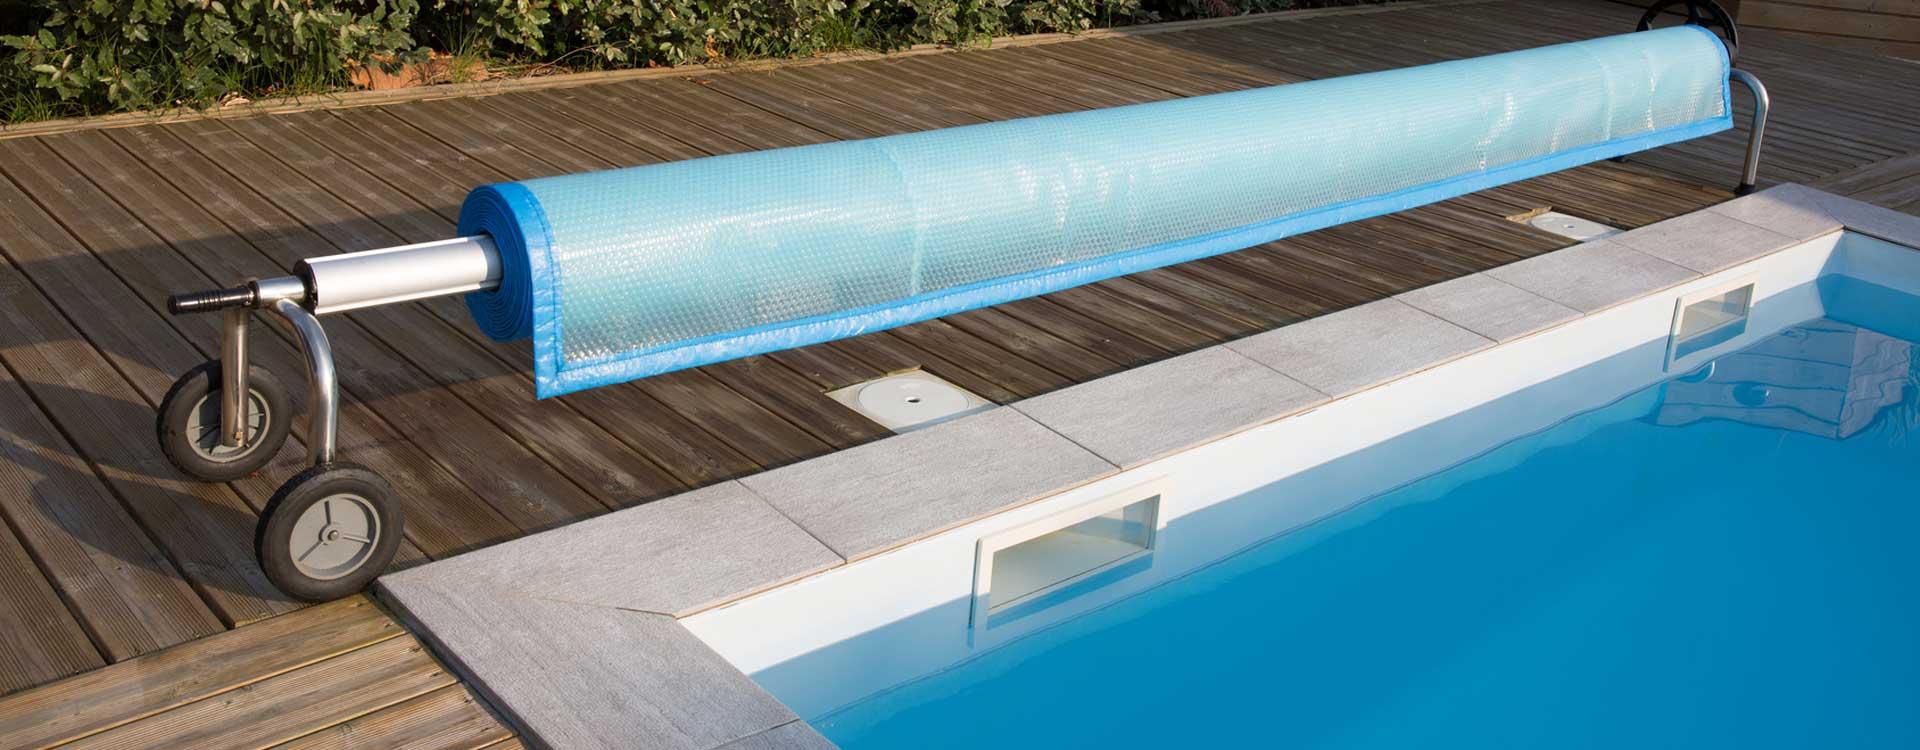 Bâche piscine Suisse